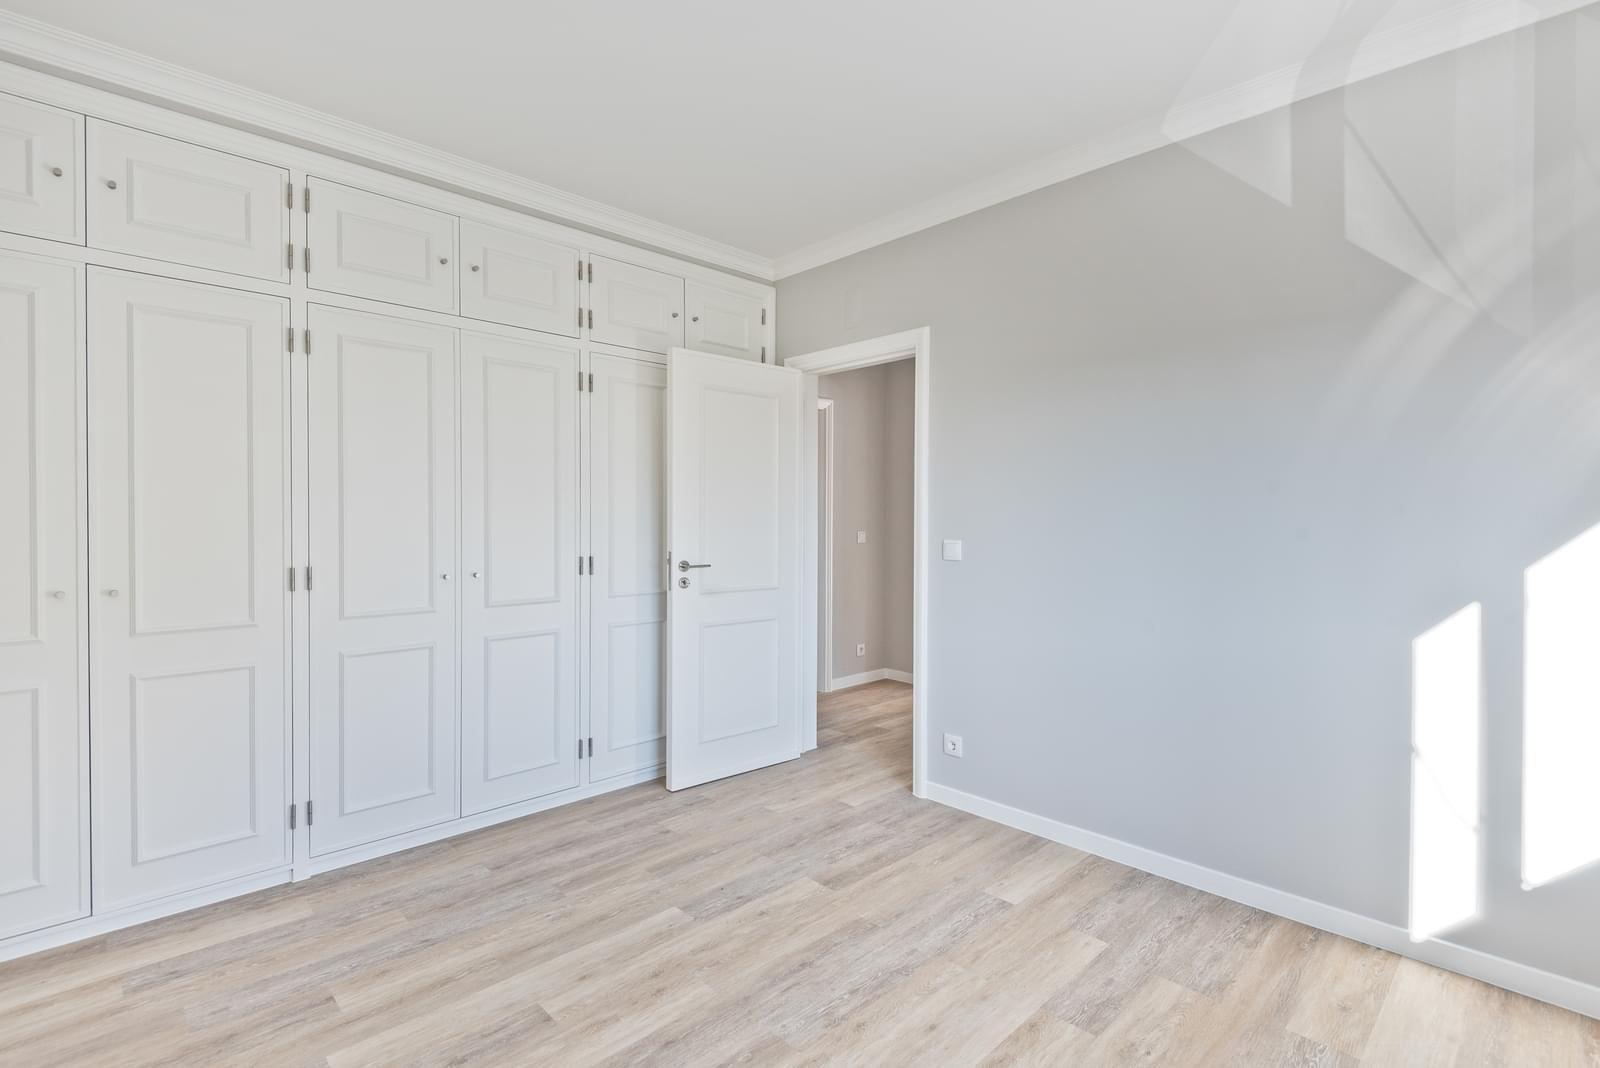 pf18907-apartamento-t2-cascais-0761c225-aa30-4c85-9fe3-398592c5b710